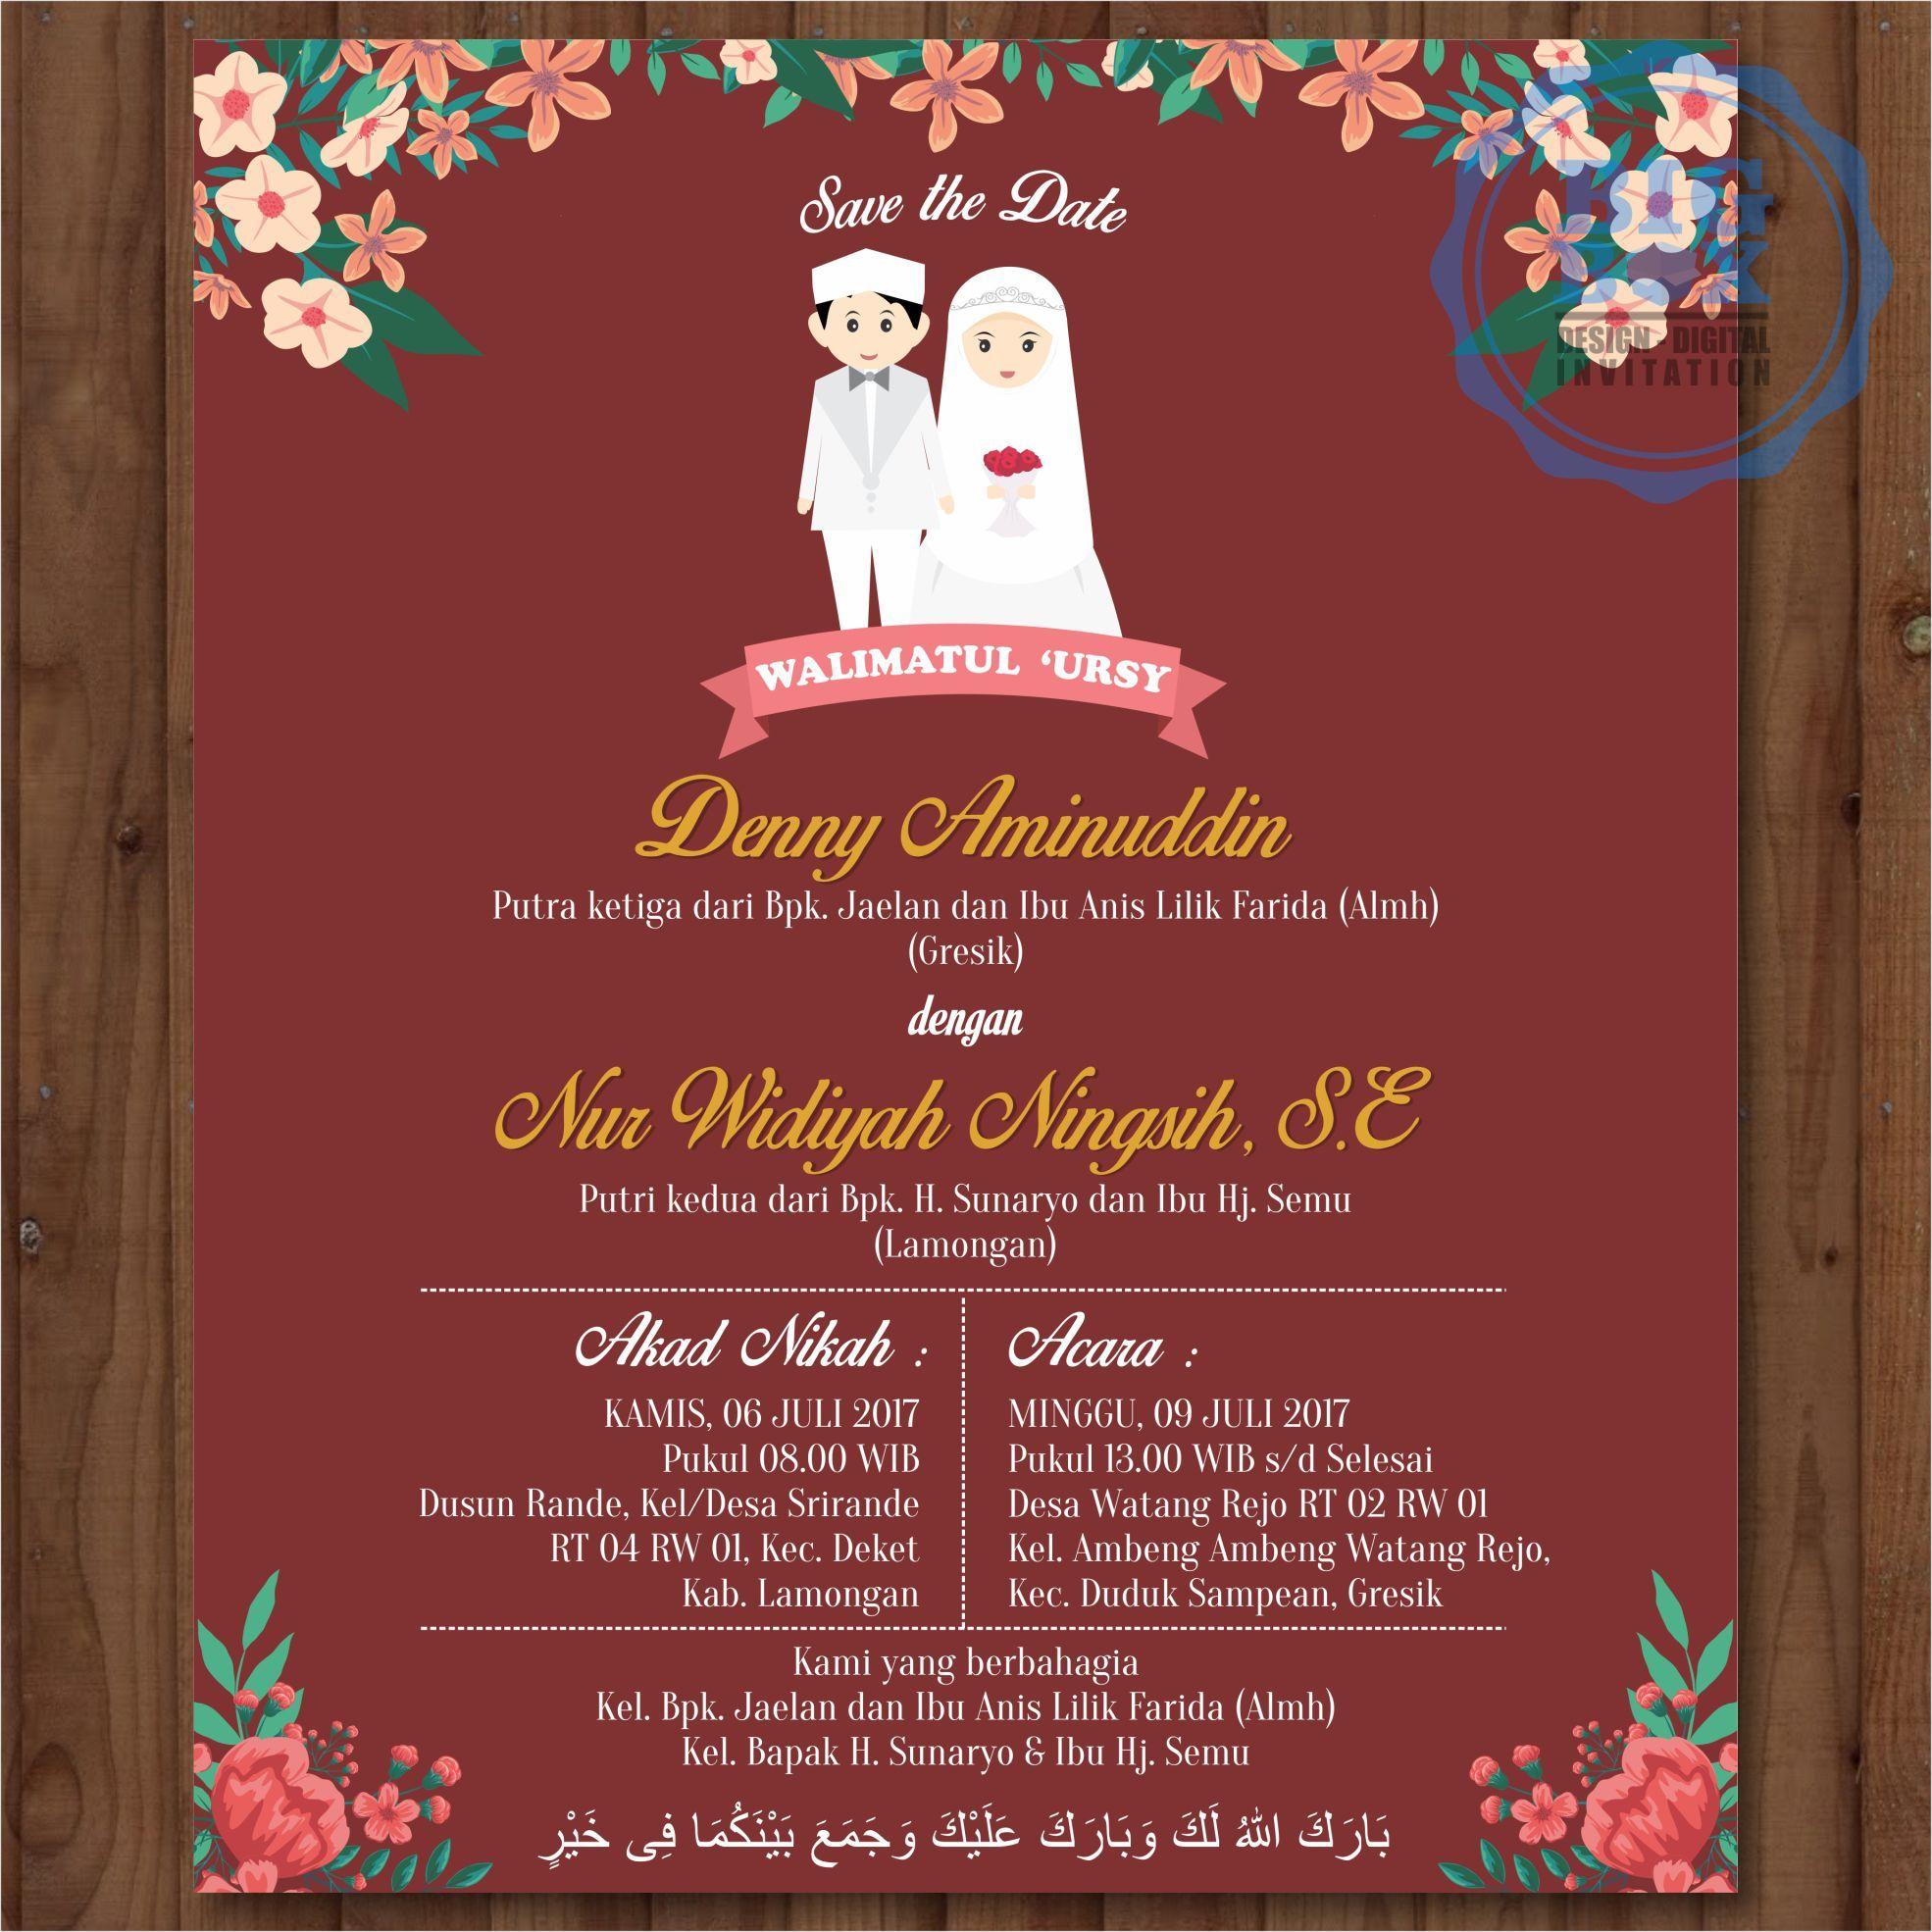 Undangan 1 Kartu Undangan Pernikahan Contoh Undangan Pernikahan Kartu Pernikahan